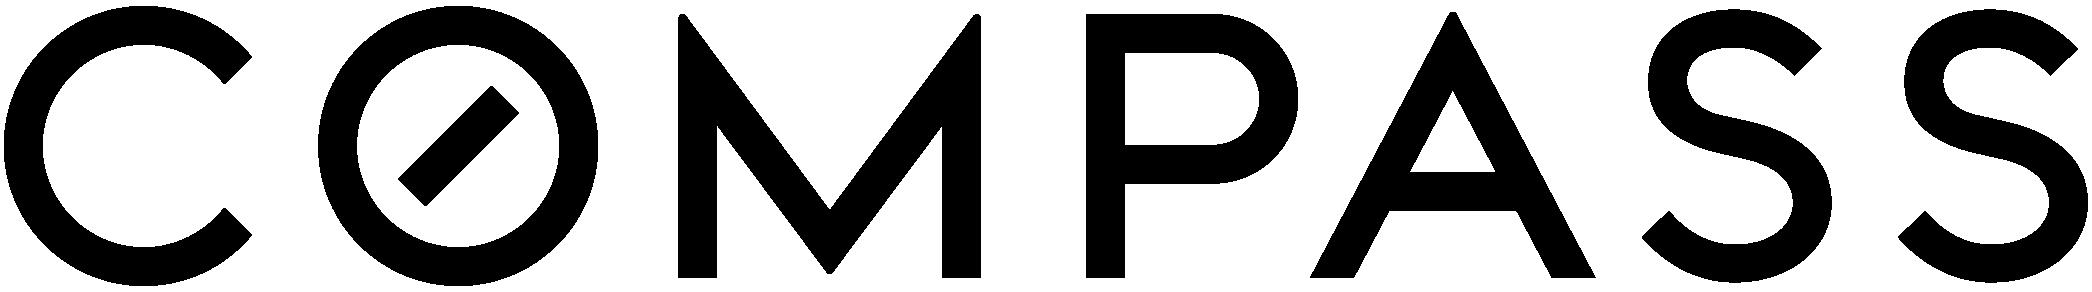 Compass_logo_black-01.png